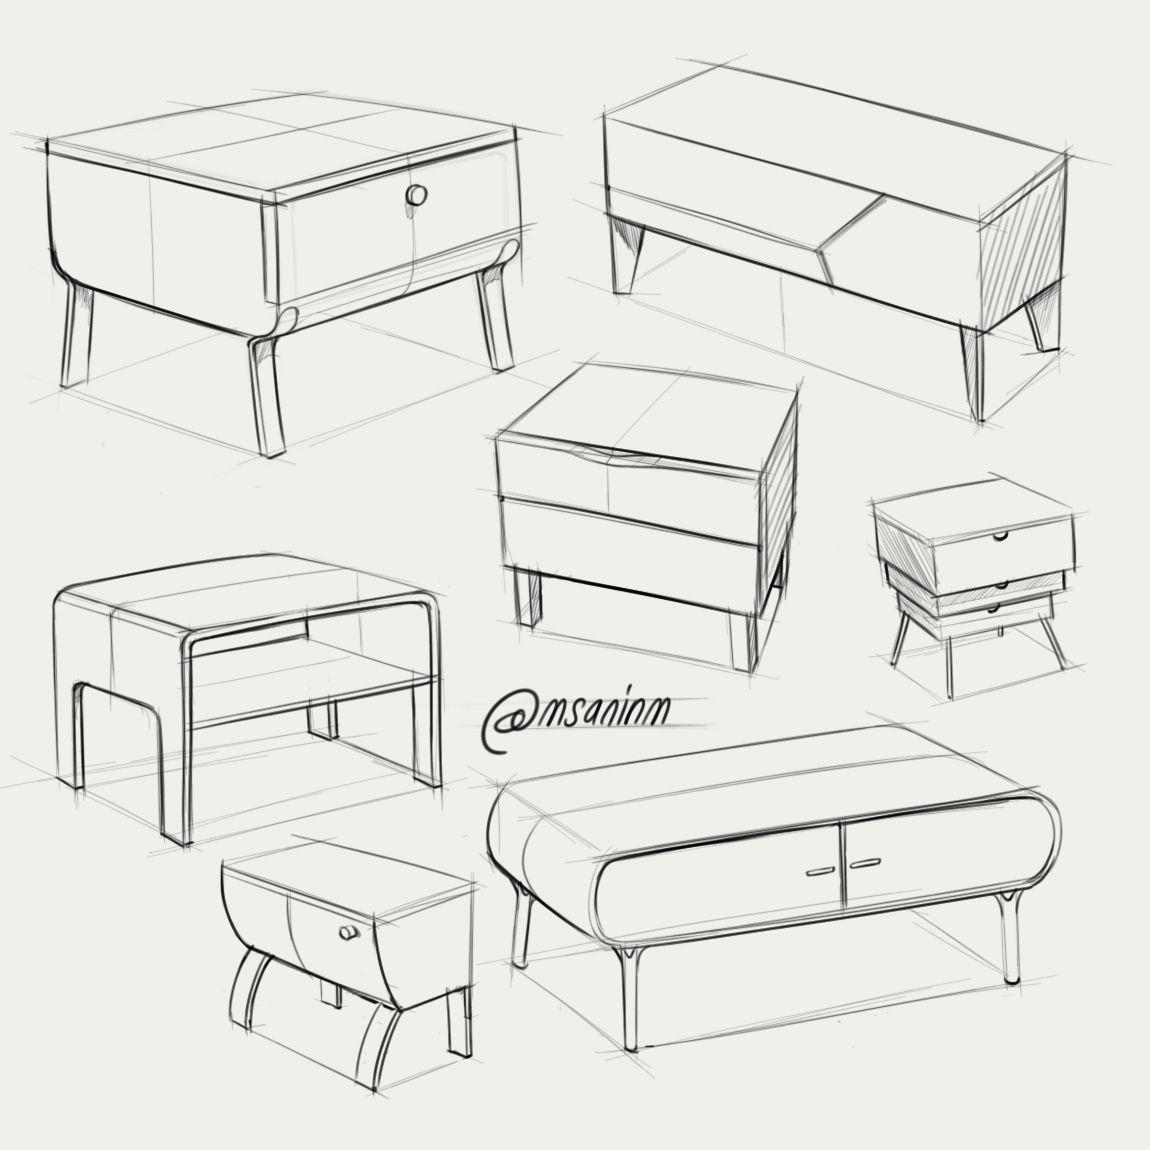 One Point Perspective Bedroom: Digital Sketchbook 2016